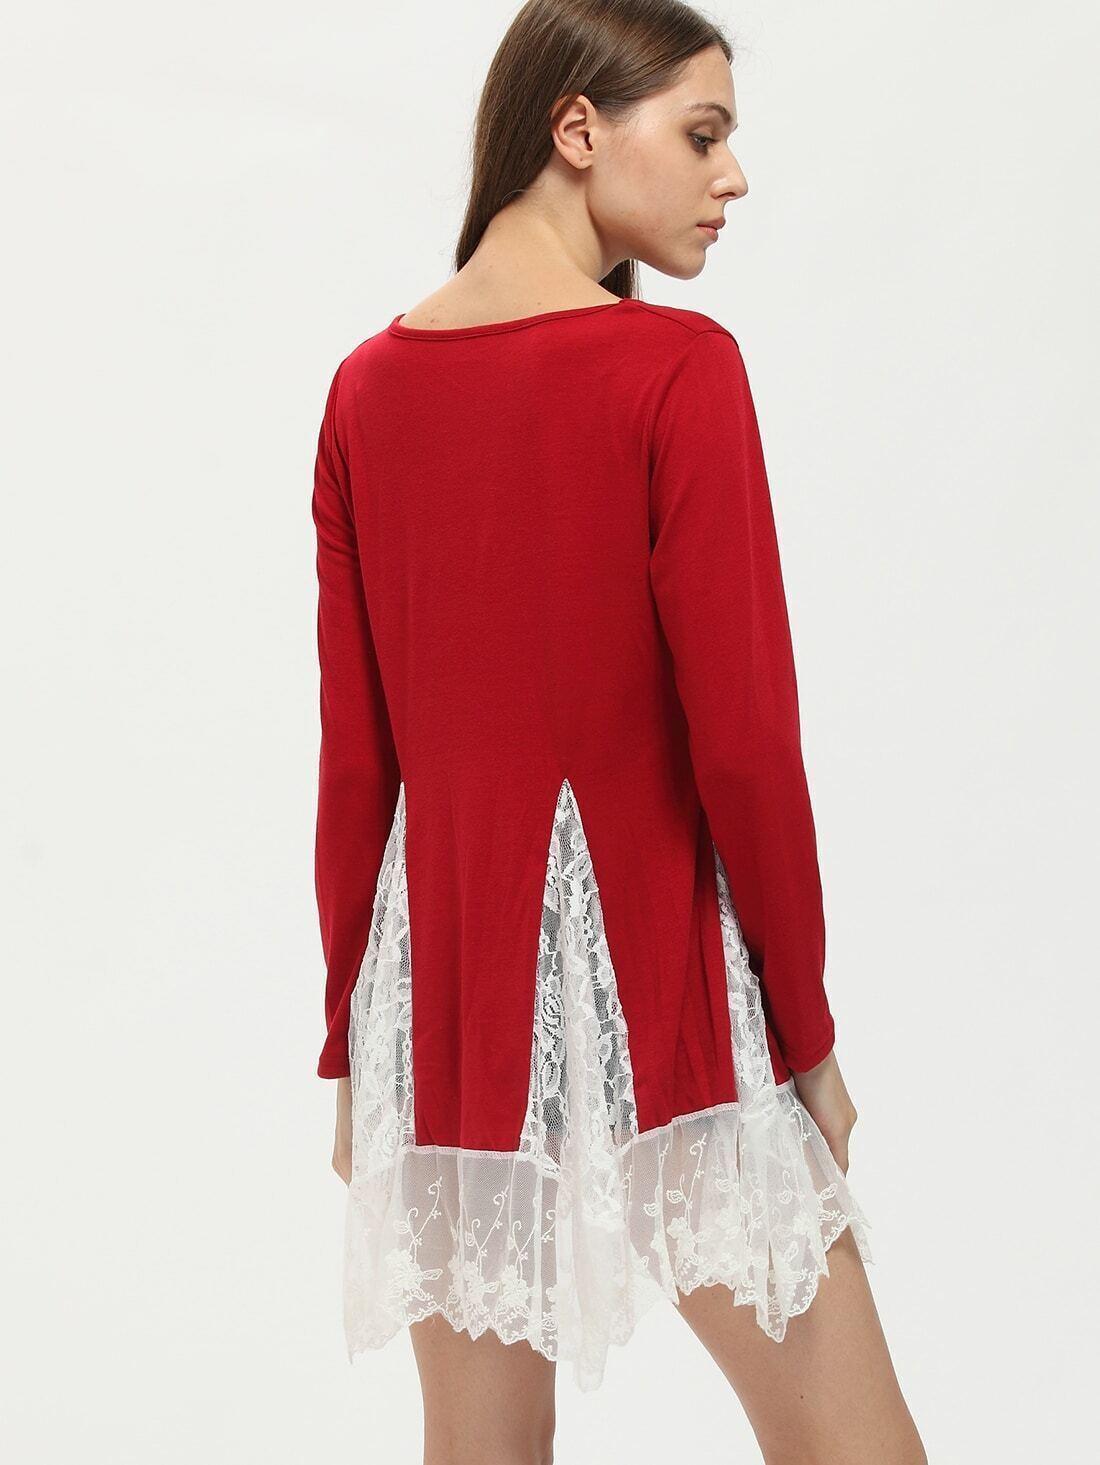 T shirt manches longues avec franges rouge french romwe for Interieur paupiere inferieure rouge